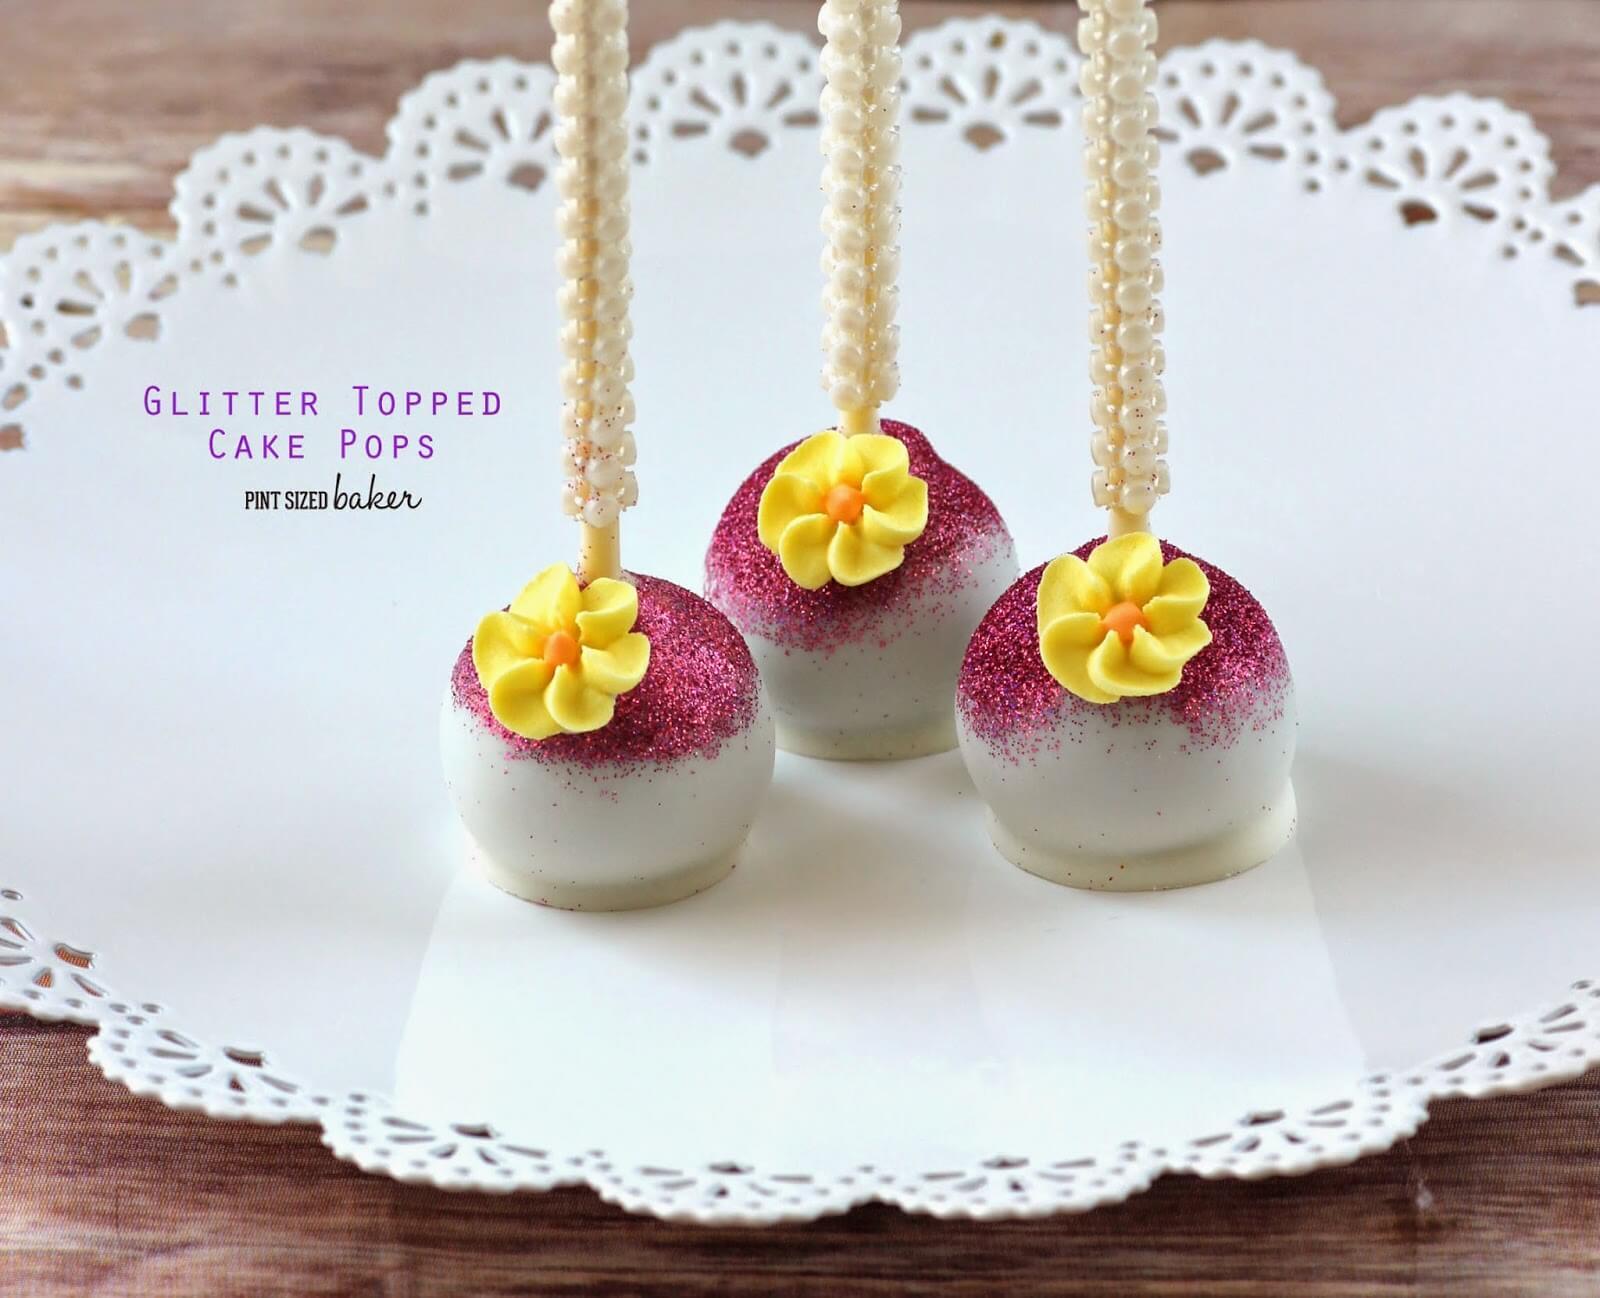 How to Make Glitter Topped Cake Pops